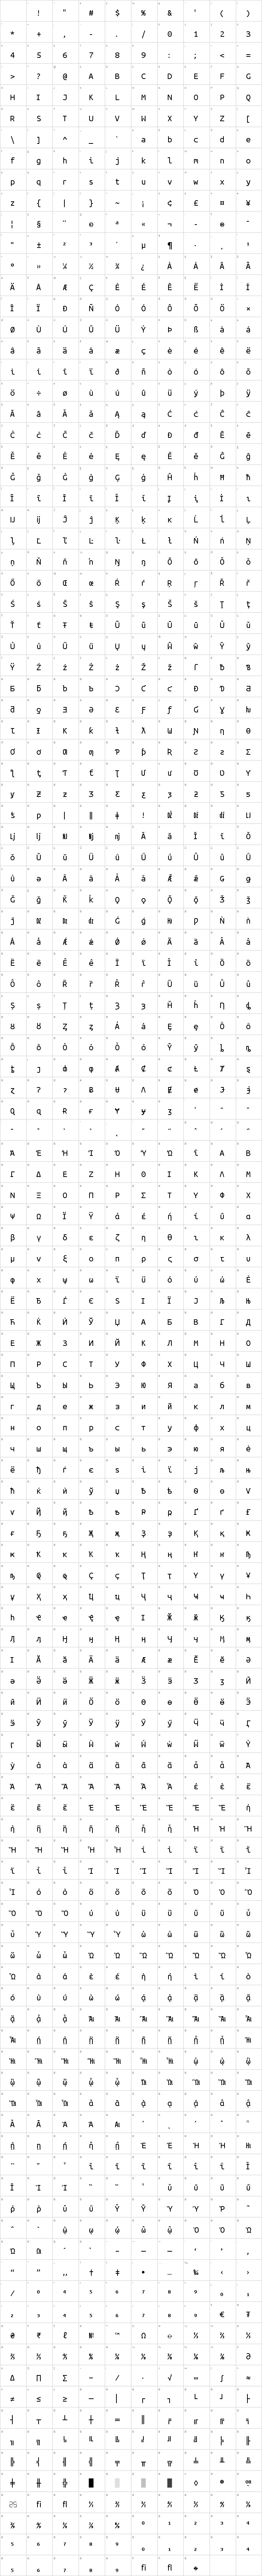 Ubuntu Mono Font Free by Dalton Maag Ltd » Font Squirrel